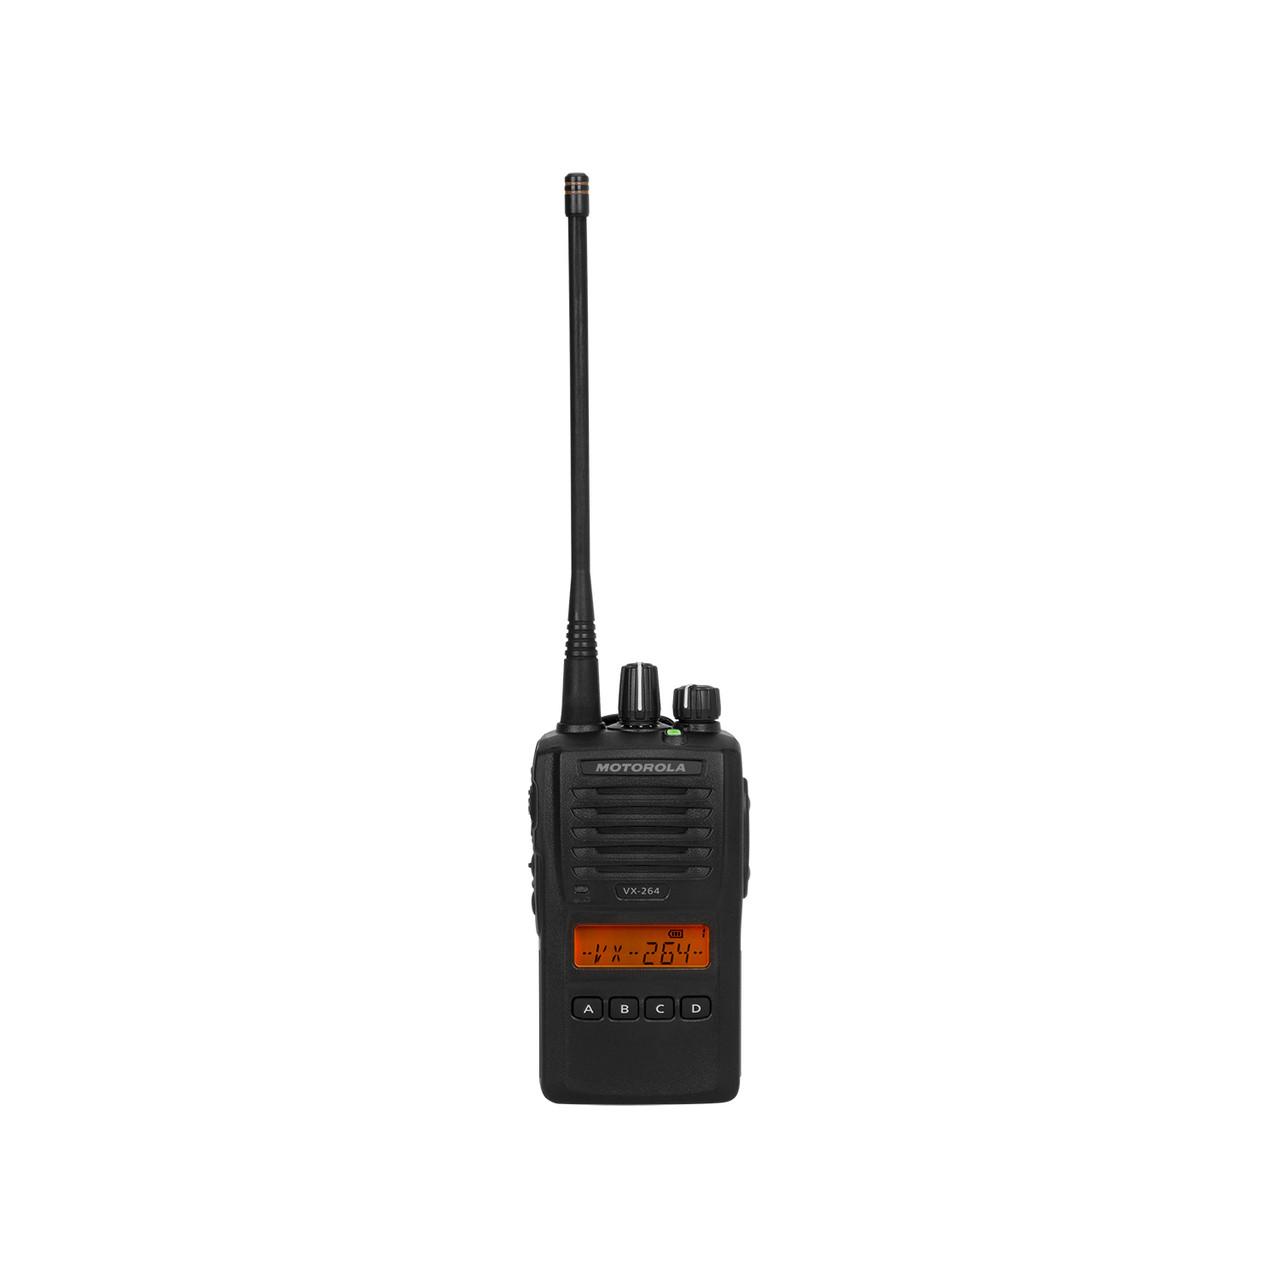 Motorola VX-264 UHF or VHF Two Way Radio